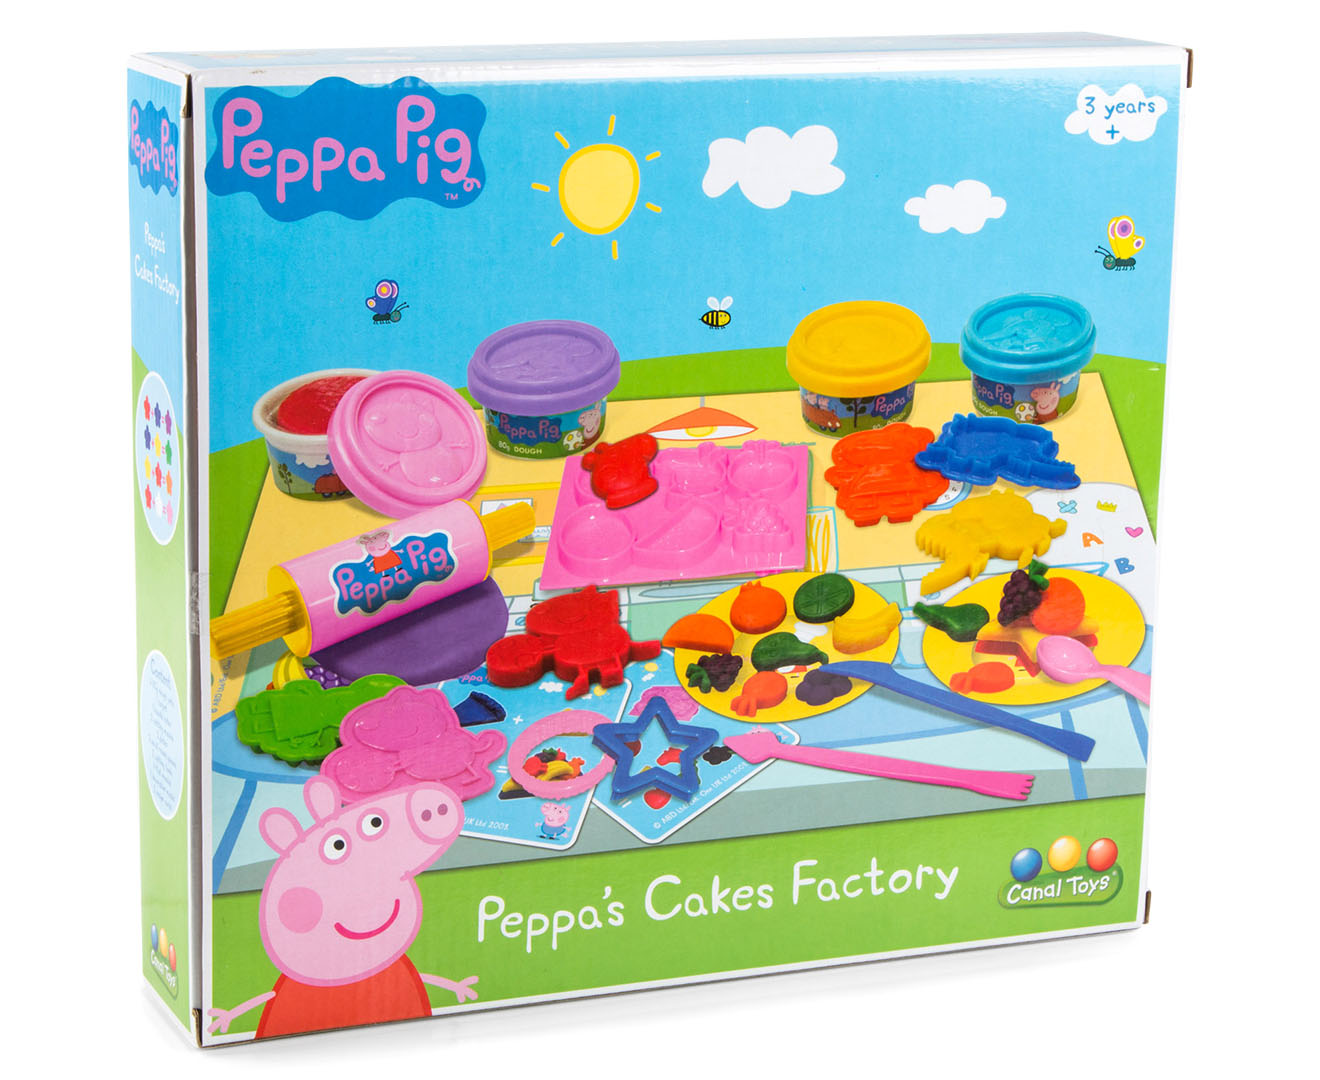 CatchOfTheDaycomau Peppa Pig Peppas Cakes Factory